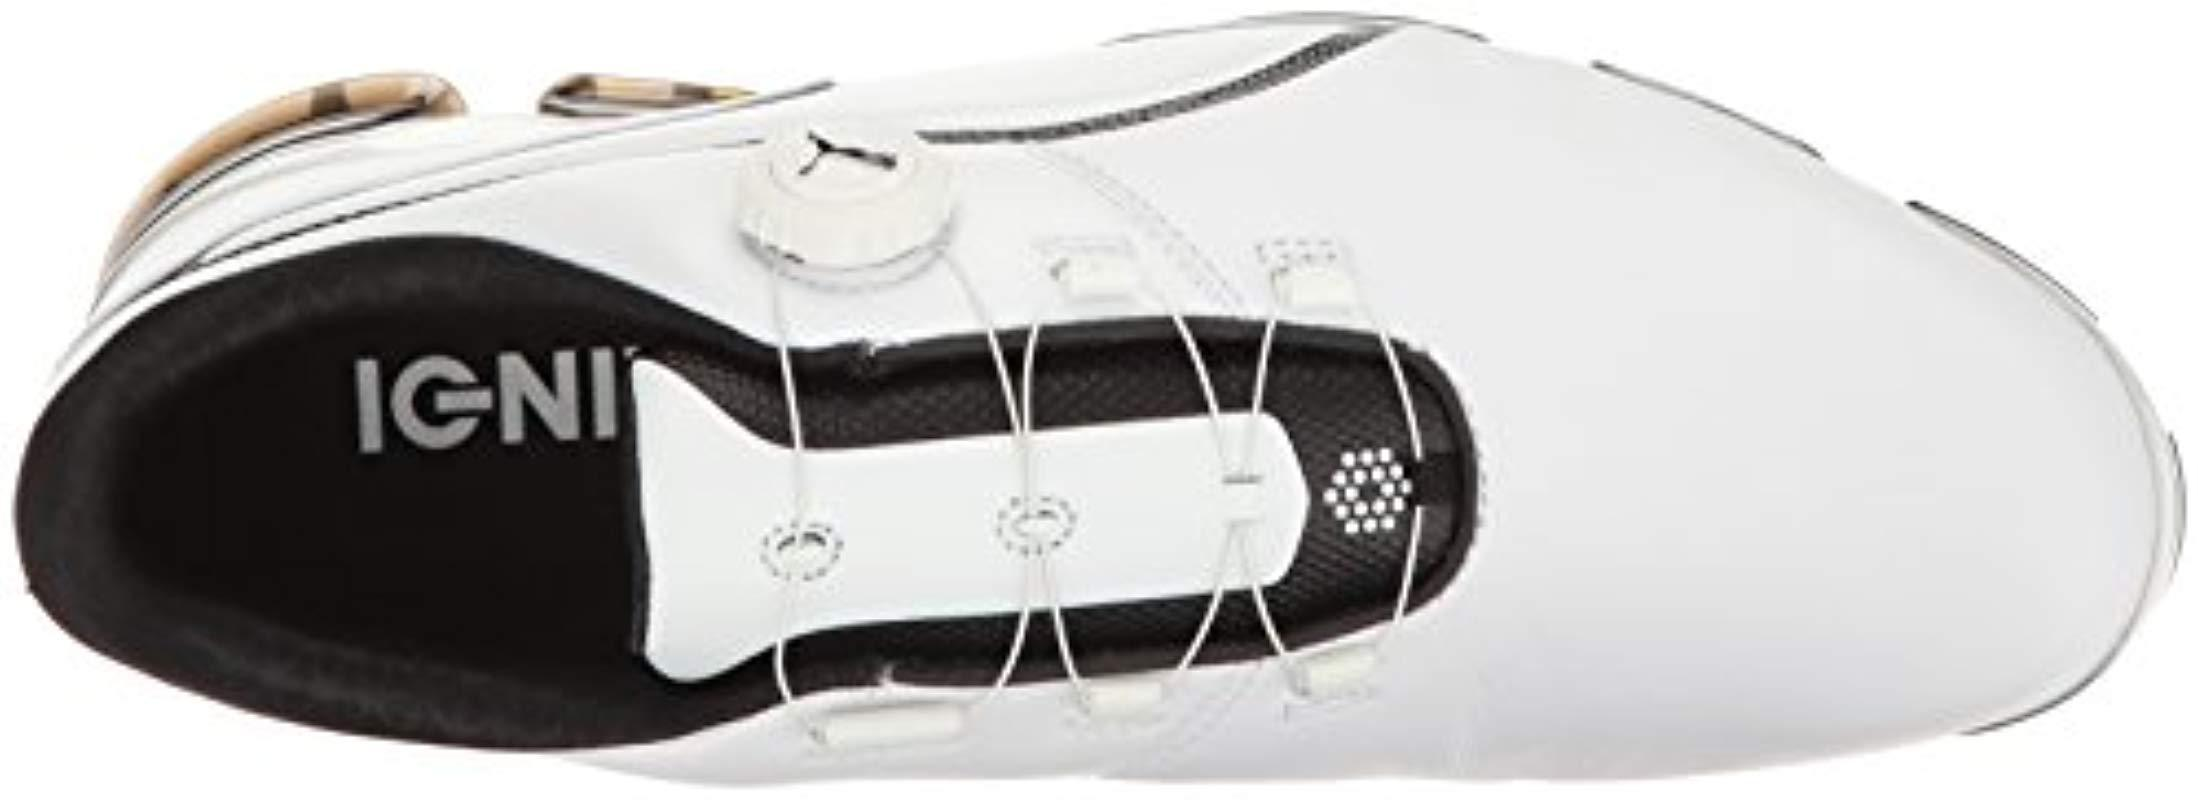 e1d7754703a PUMA - Black Titantour Ignite Disc Golf-shoes for Men - Lyst. View  fullscreen